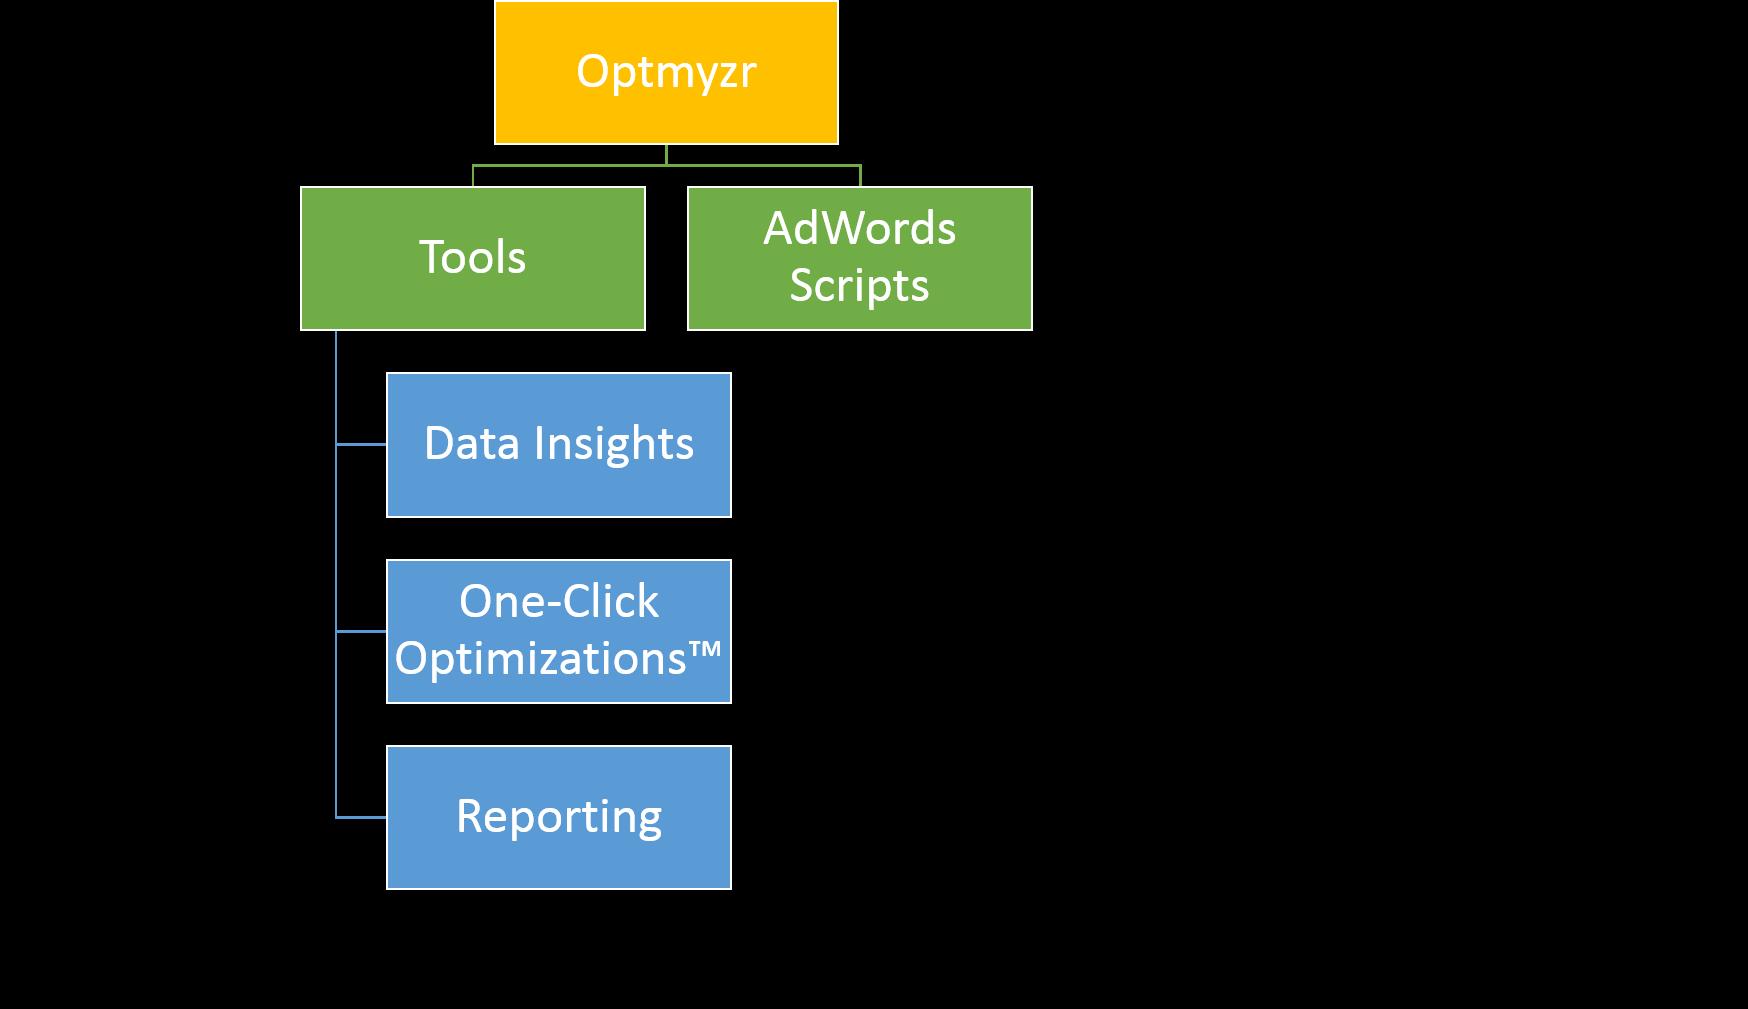 Optmyzr Tools